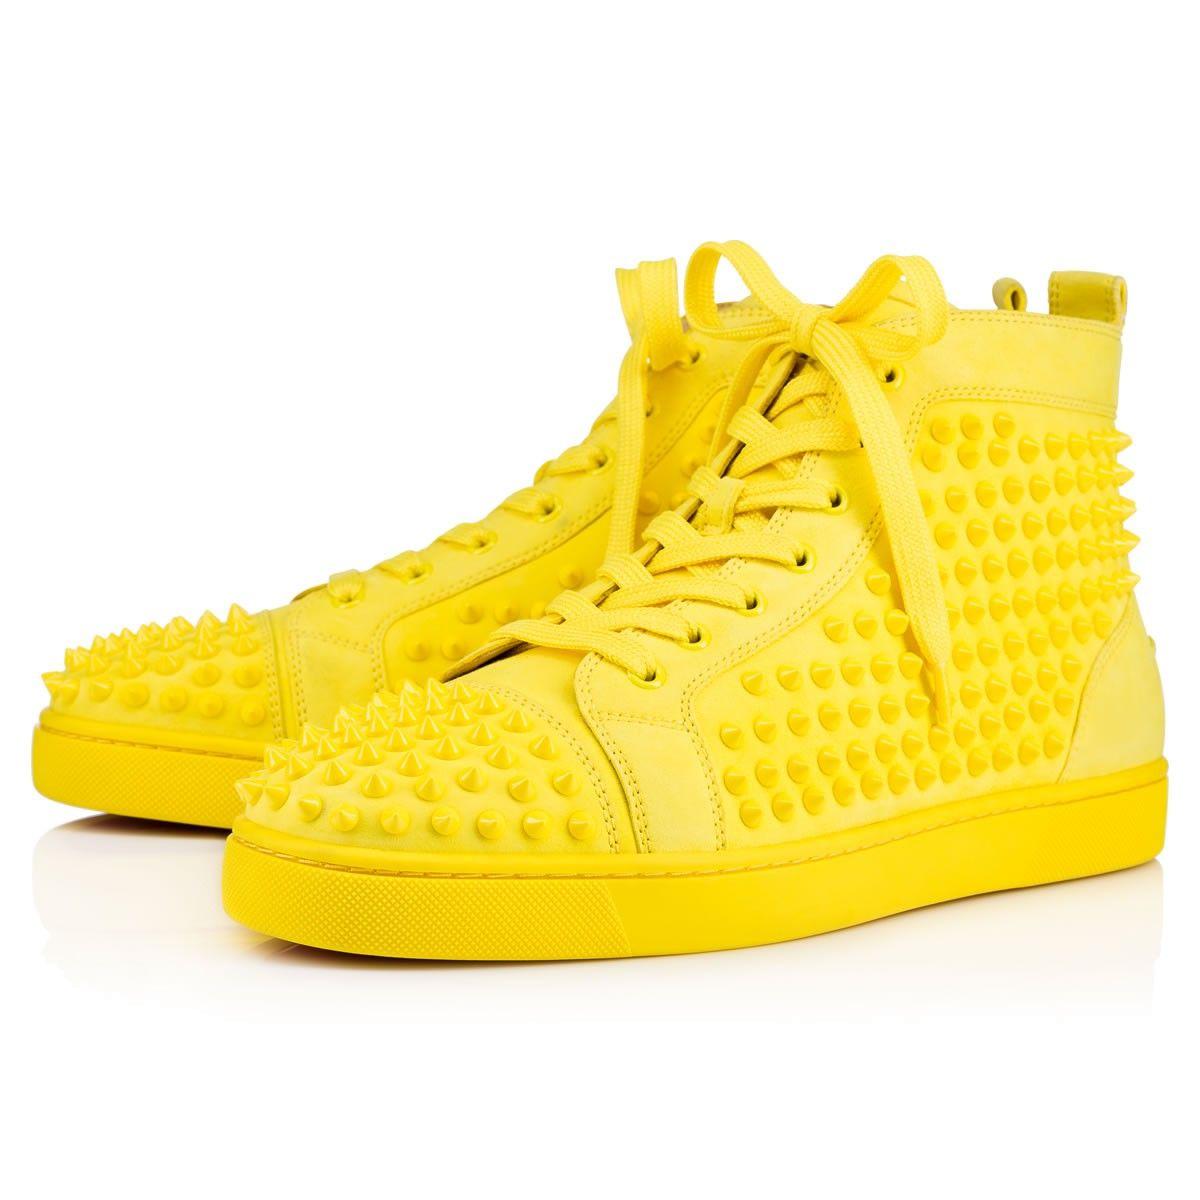 christian louboutin yellow sneakers